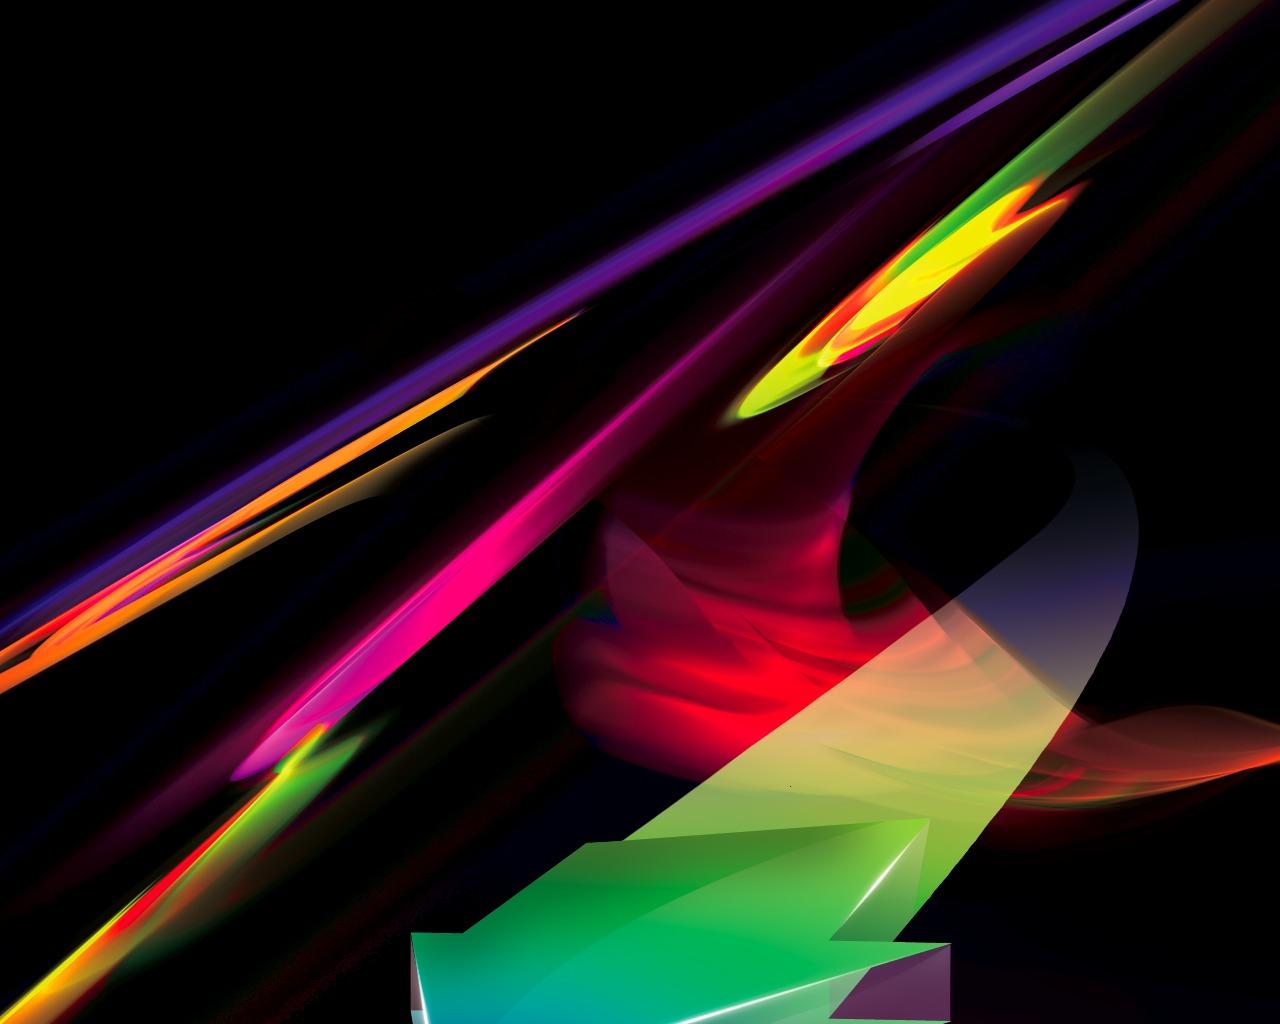 http://2.bp.blogspot.com/-epIZws3dqNw/TmdIxBiO1cI/AAAAAAAADds/gC5-oJ0s5CE/s1600/Razor_Rainbow_Colors.jpg